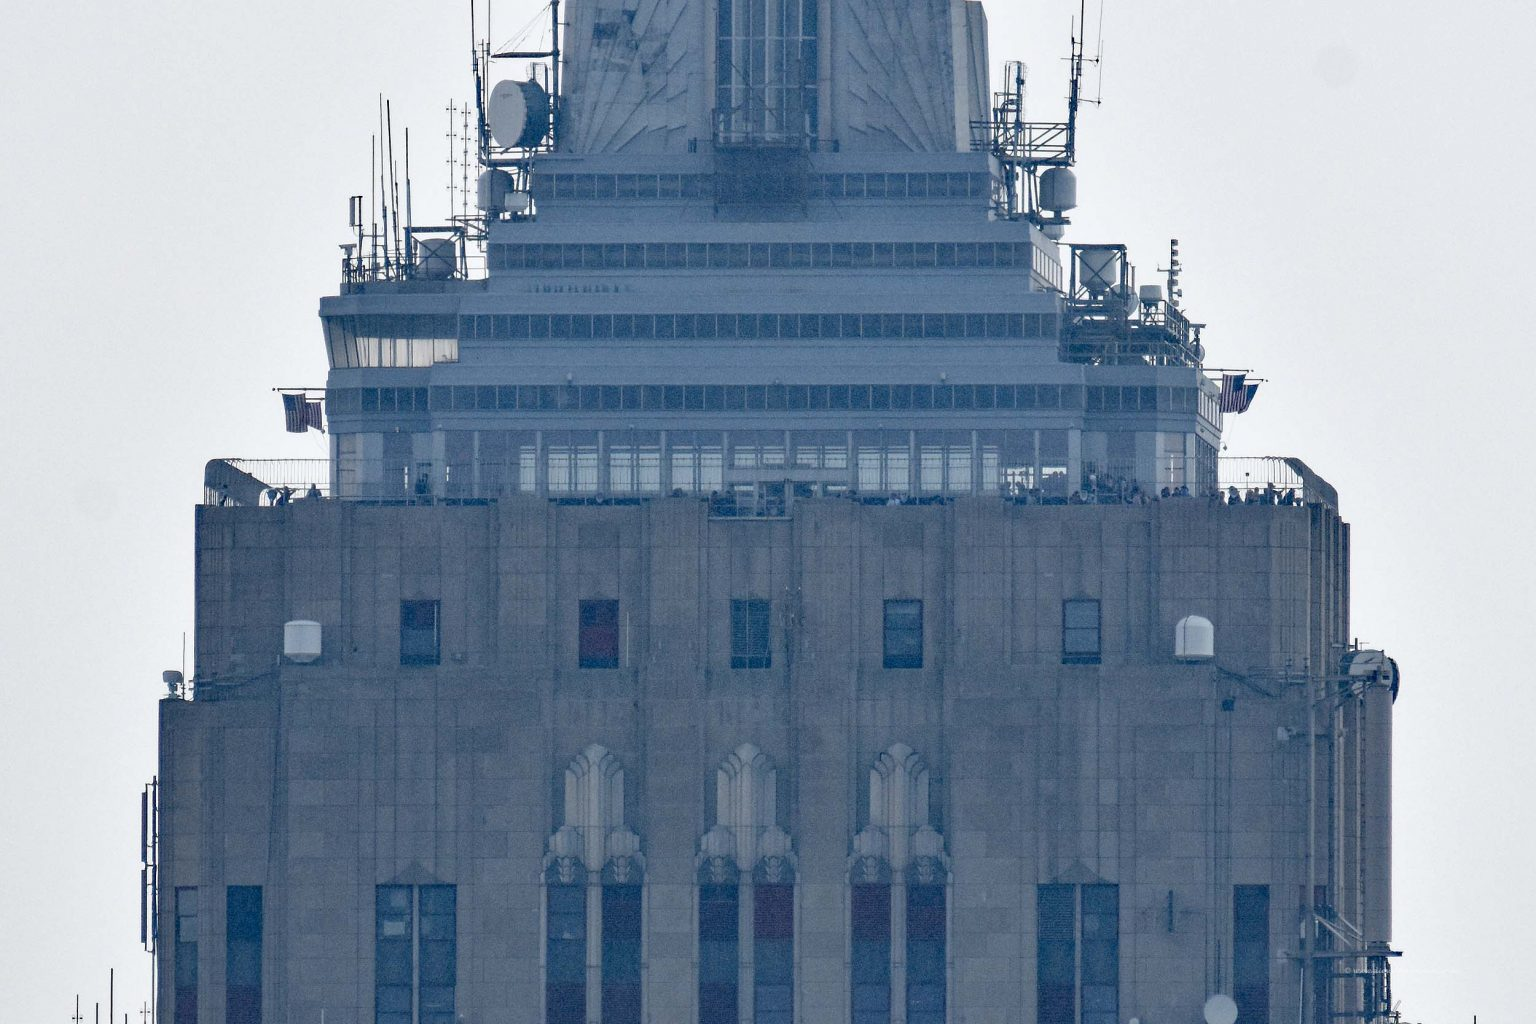 Blick hinüber zum Empire State Building